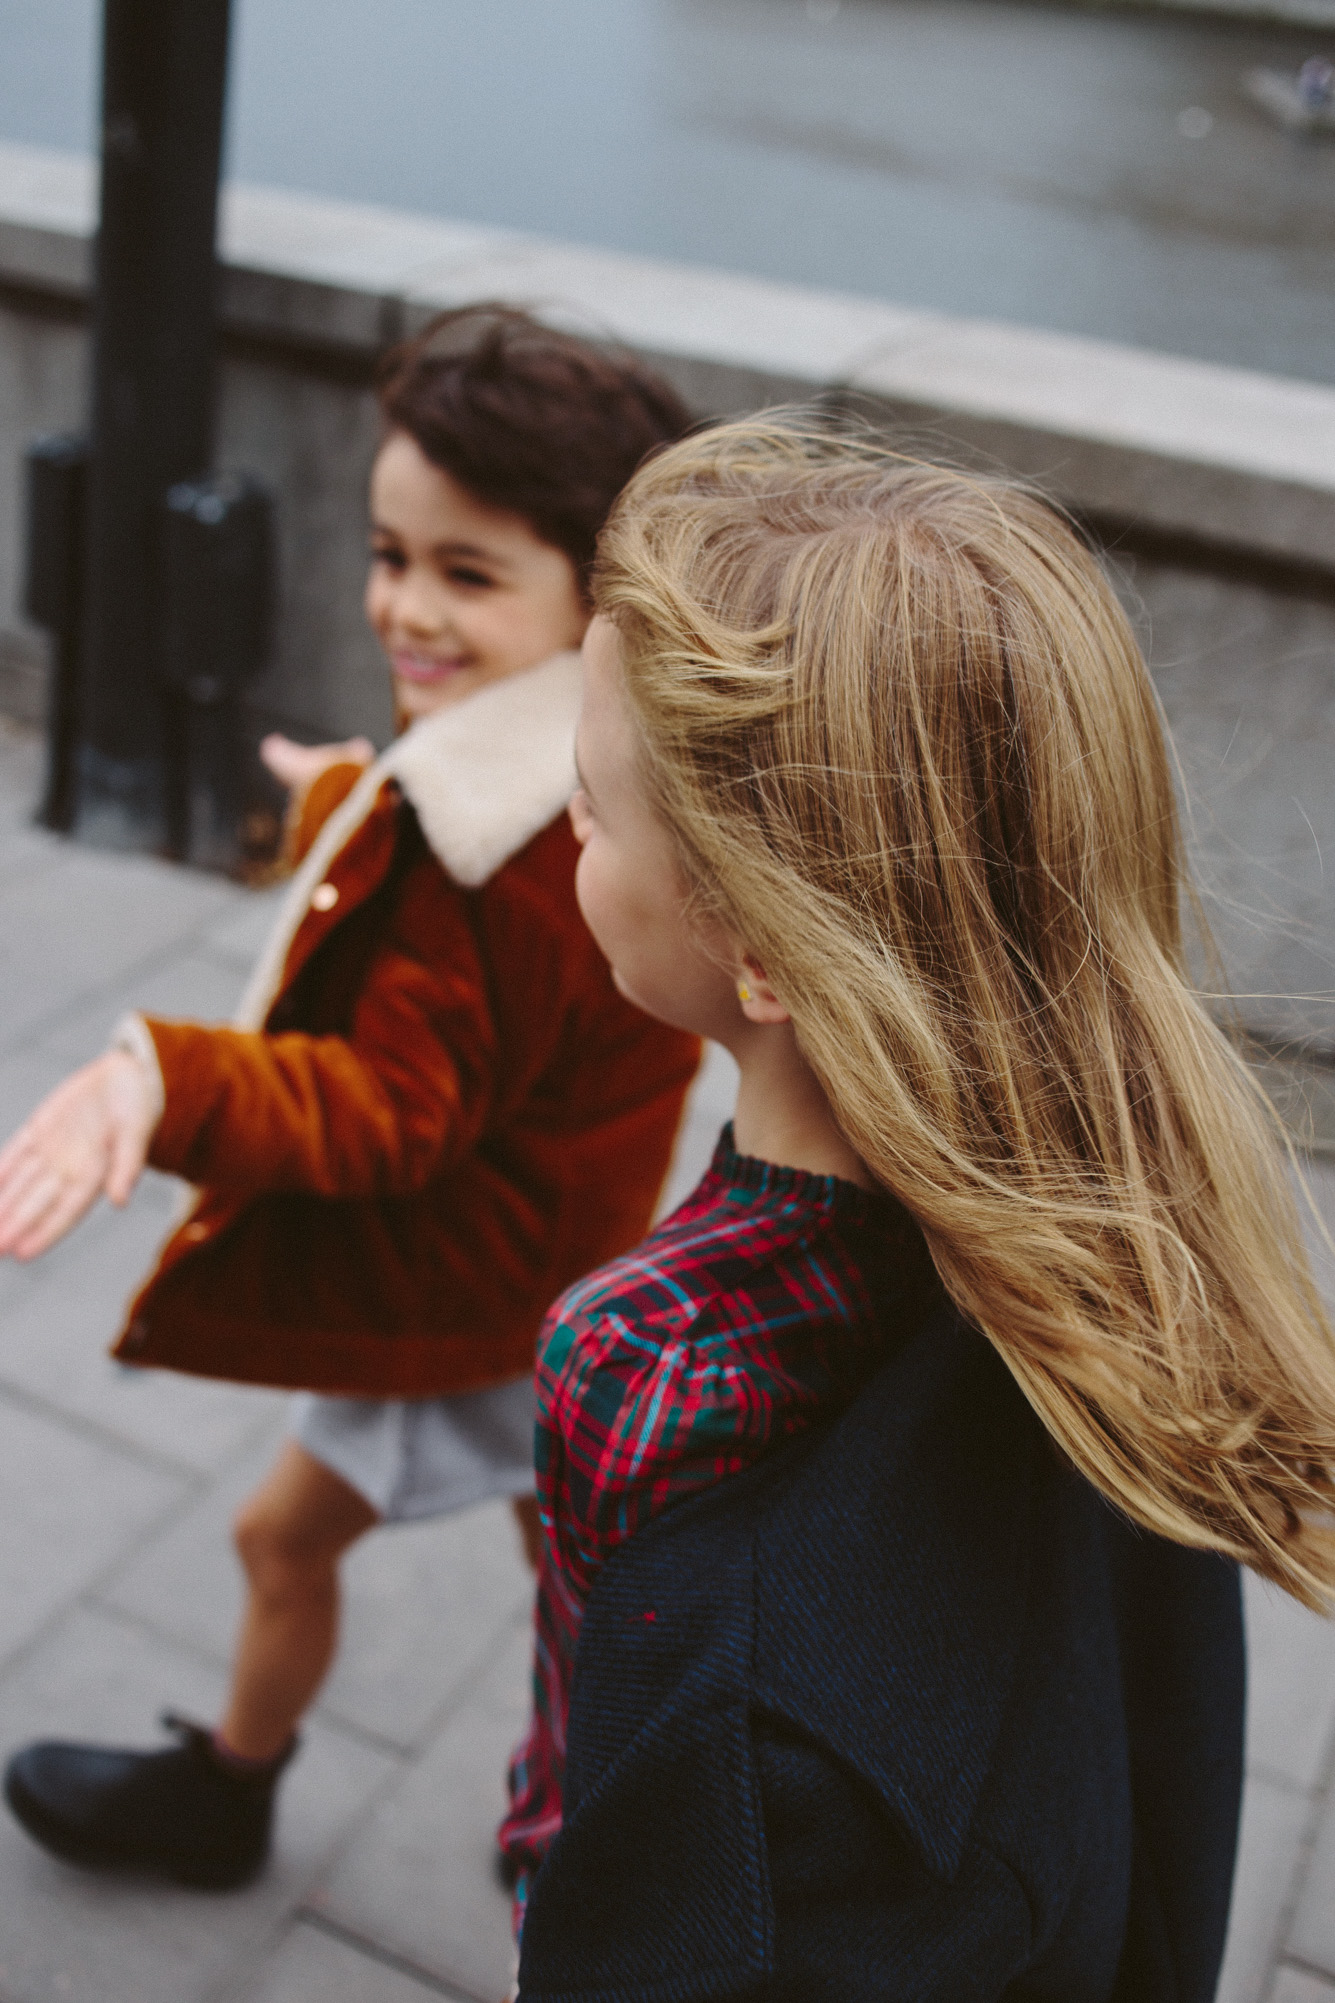 stockholm-kids-cityguide-conbotasdeagua-33.jpg